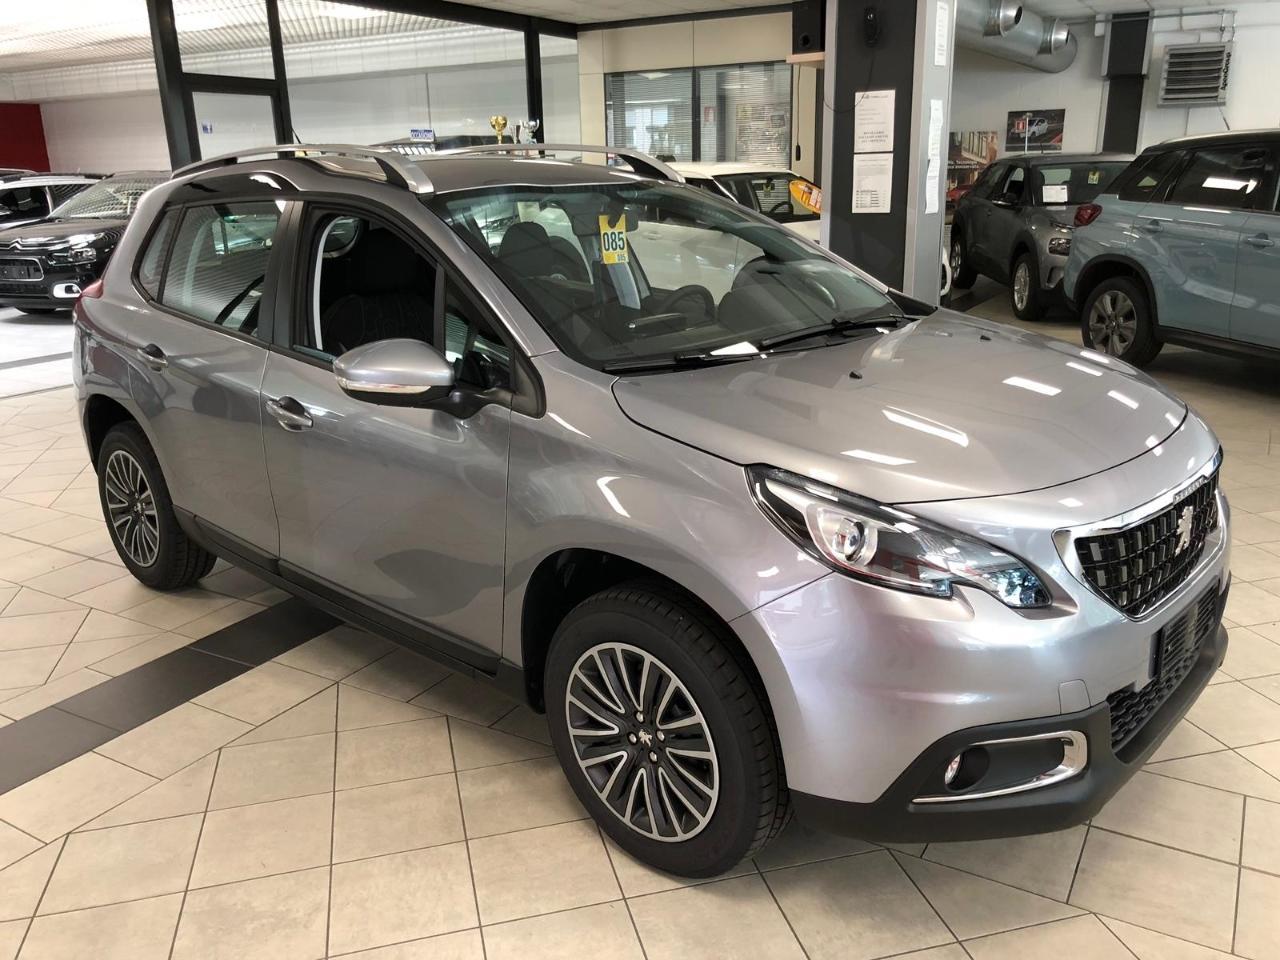 Consumi Peugeot 2013 - 2019 - Reali indicati dai ...